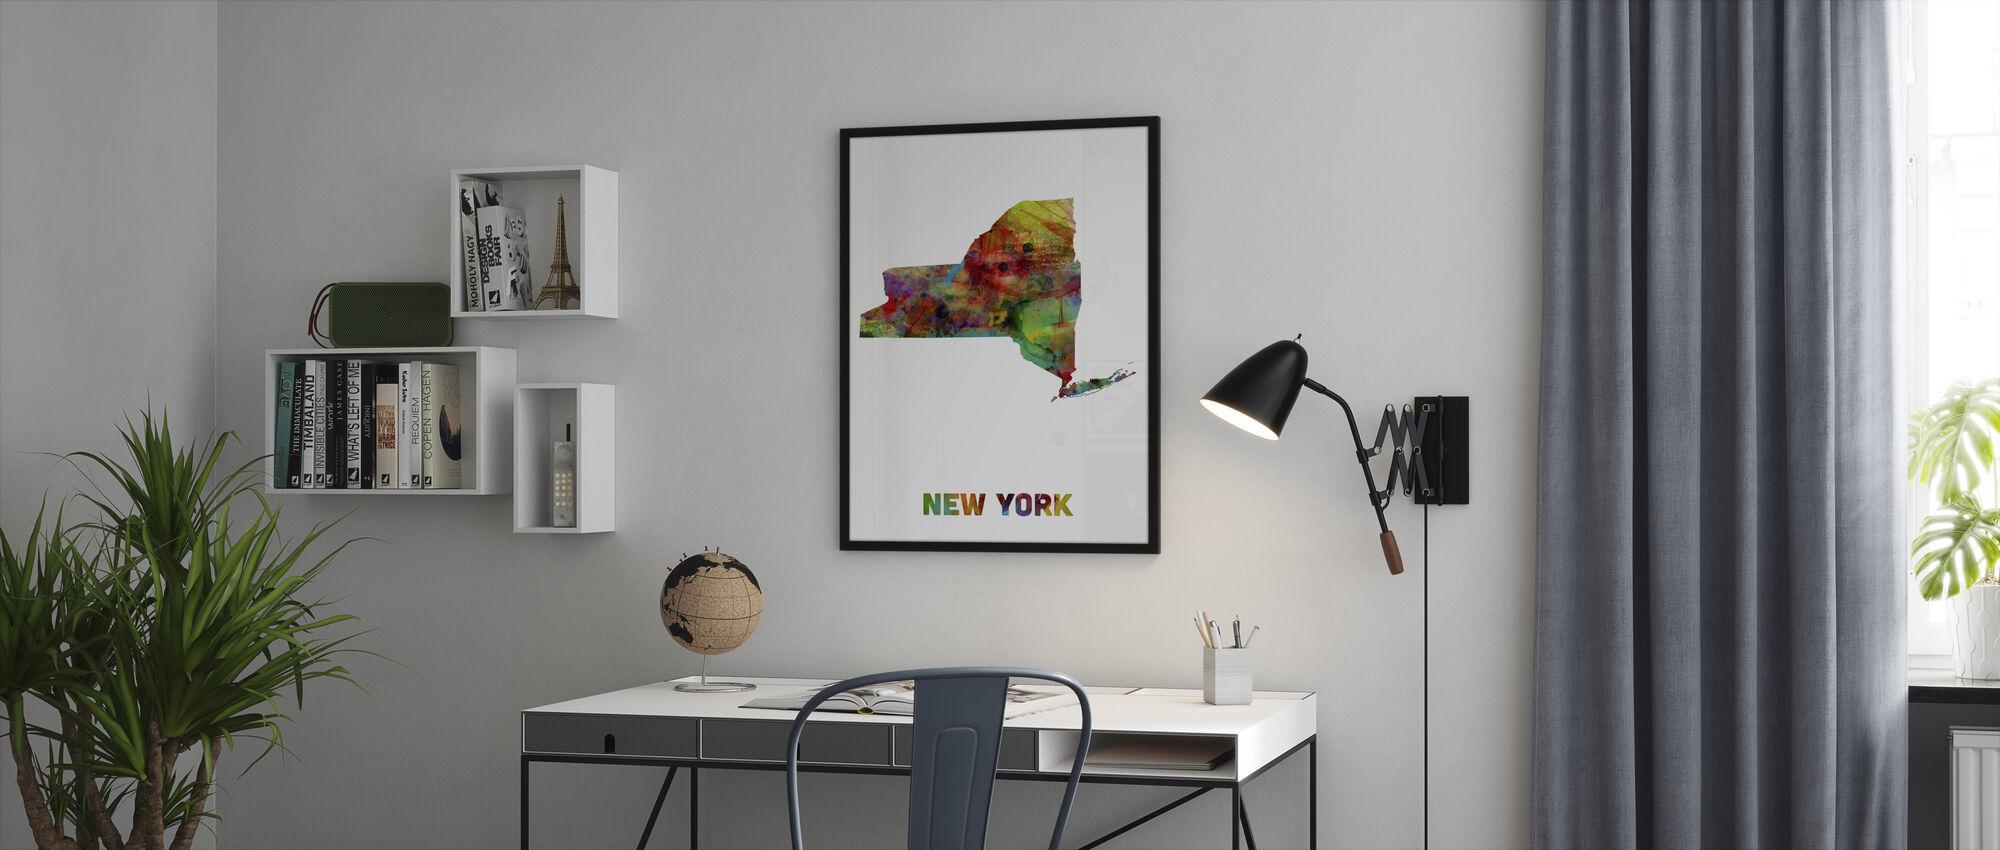 New York State Map - Framed print - Office